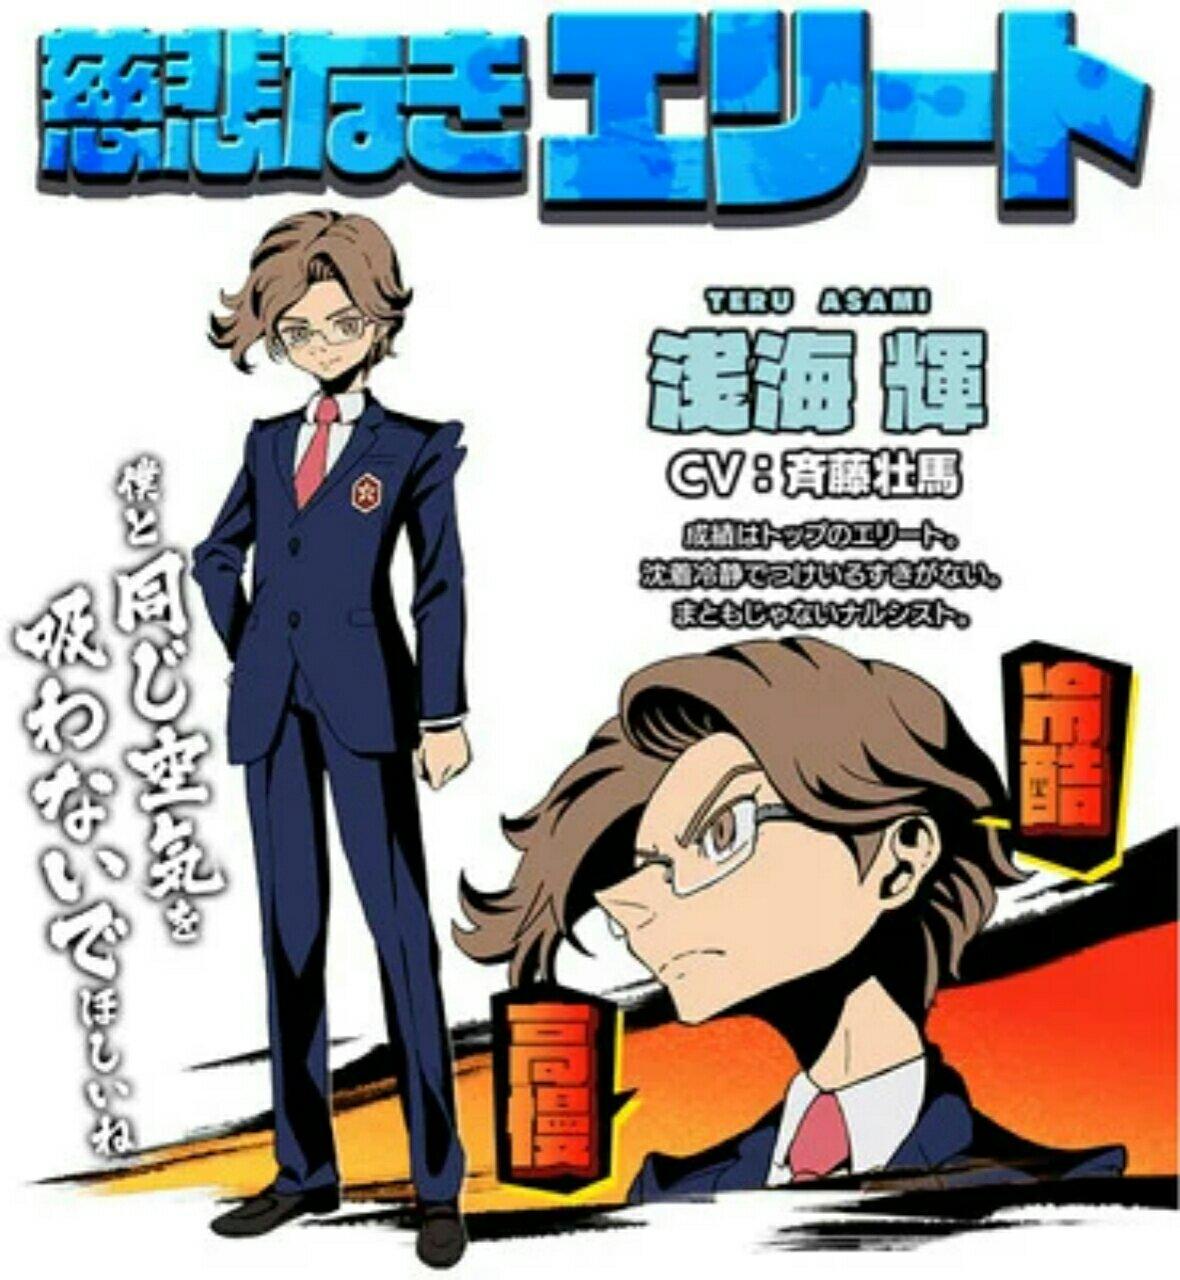 Anime TV Robot Megaton Musashi dari Level-5 akan Tayang Perdana pada Musim Panas 2021 3